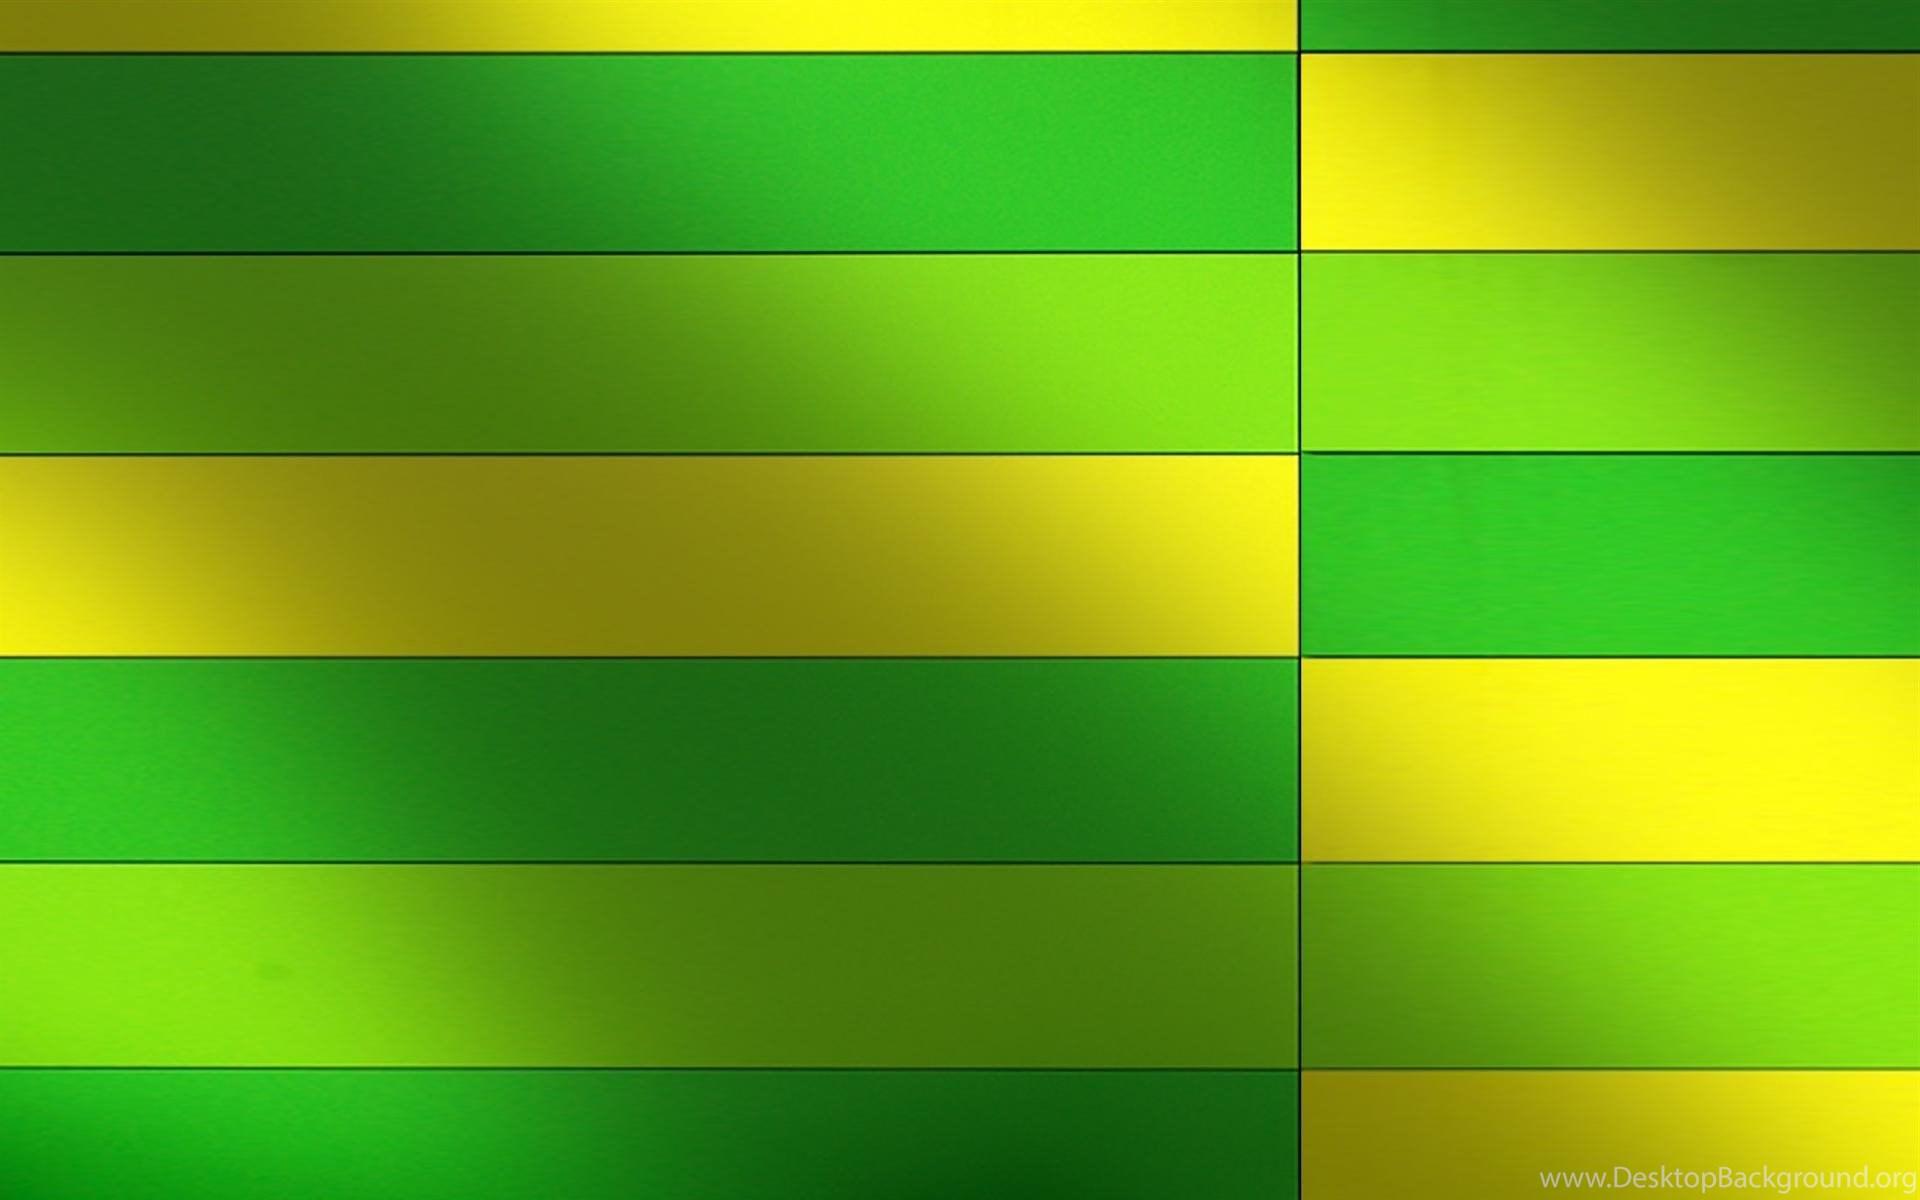 Картинка желто зеленого цвета просто фон